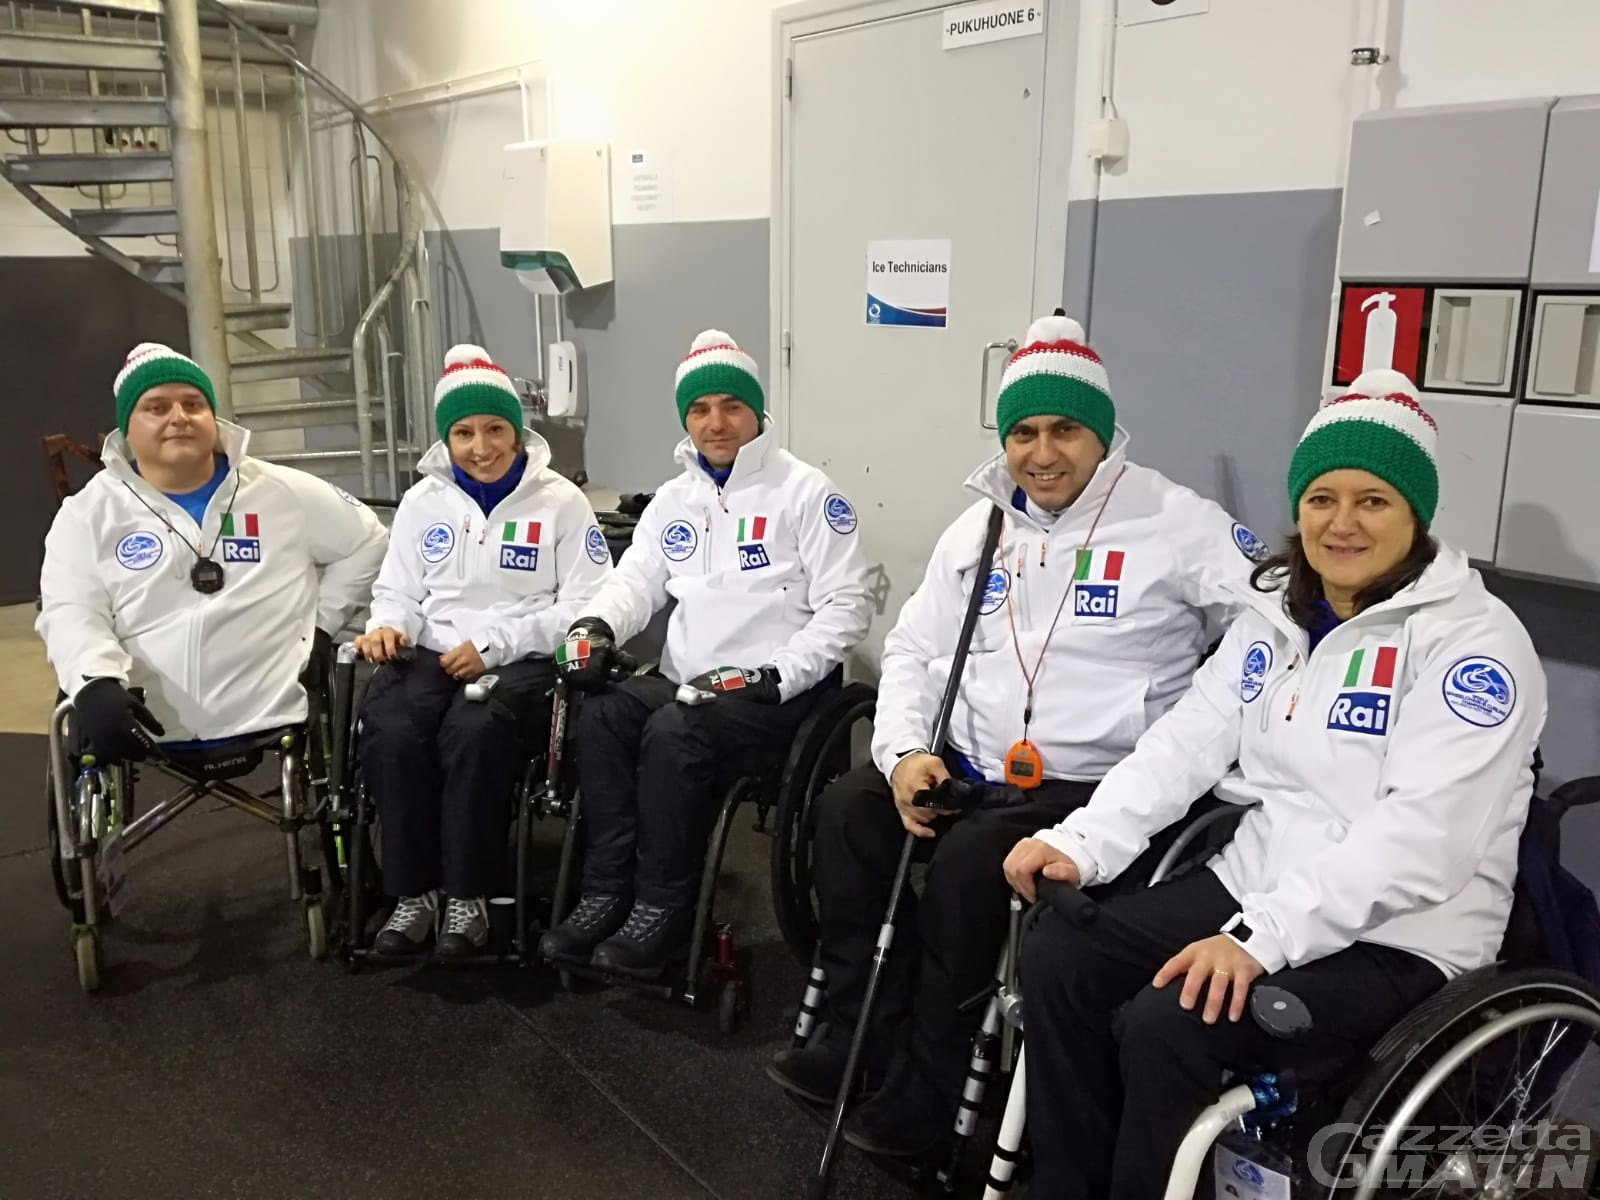 Wheelchair curling: Italia quinta ai Mondiali B di Lohja